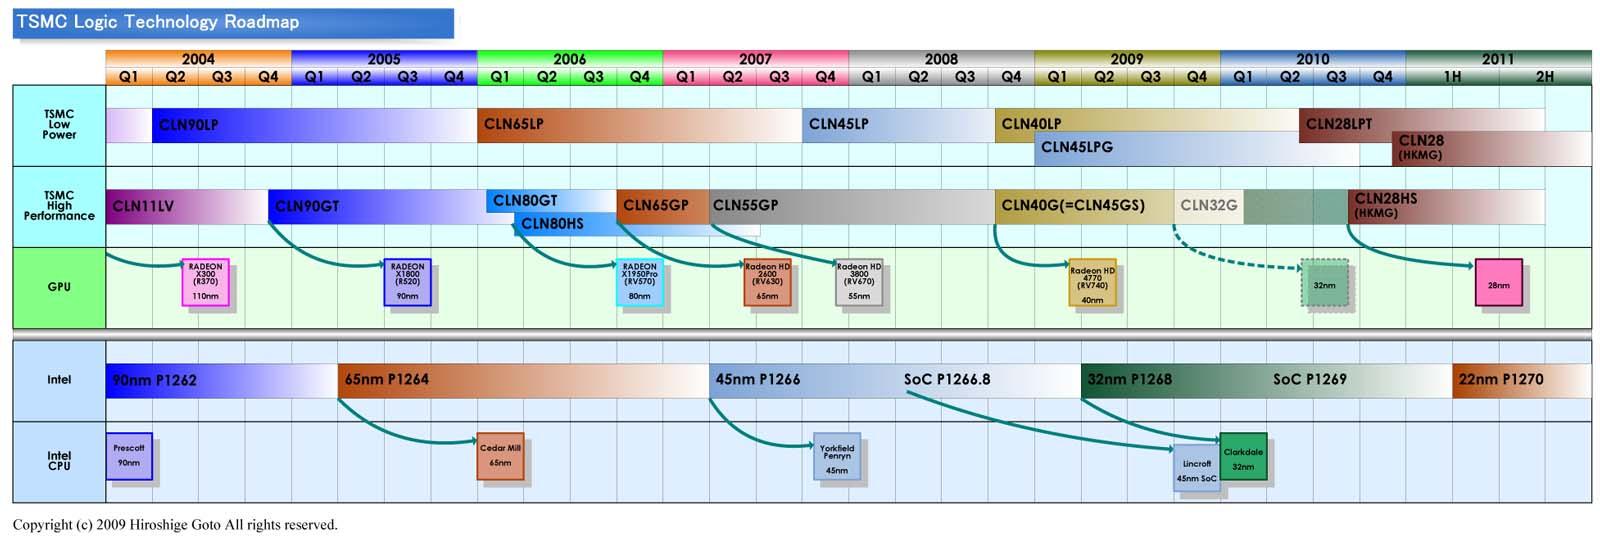 "TSMCプロセスロードマップ<br>PDF版は<a ipw_linktype=""filelink_raw"" ipw_id=""651318"" href=""/video/pcw/docs/359/423/09p.pdf"">こちら</a>"